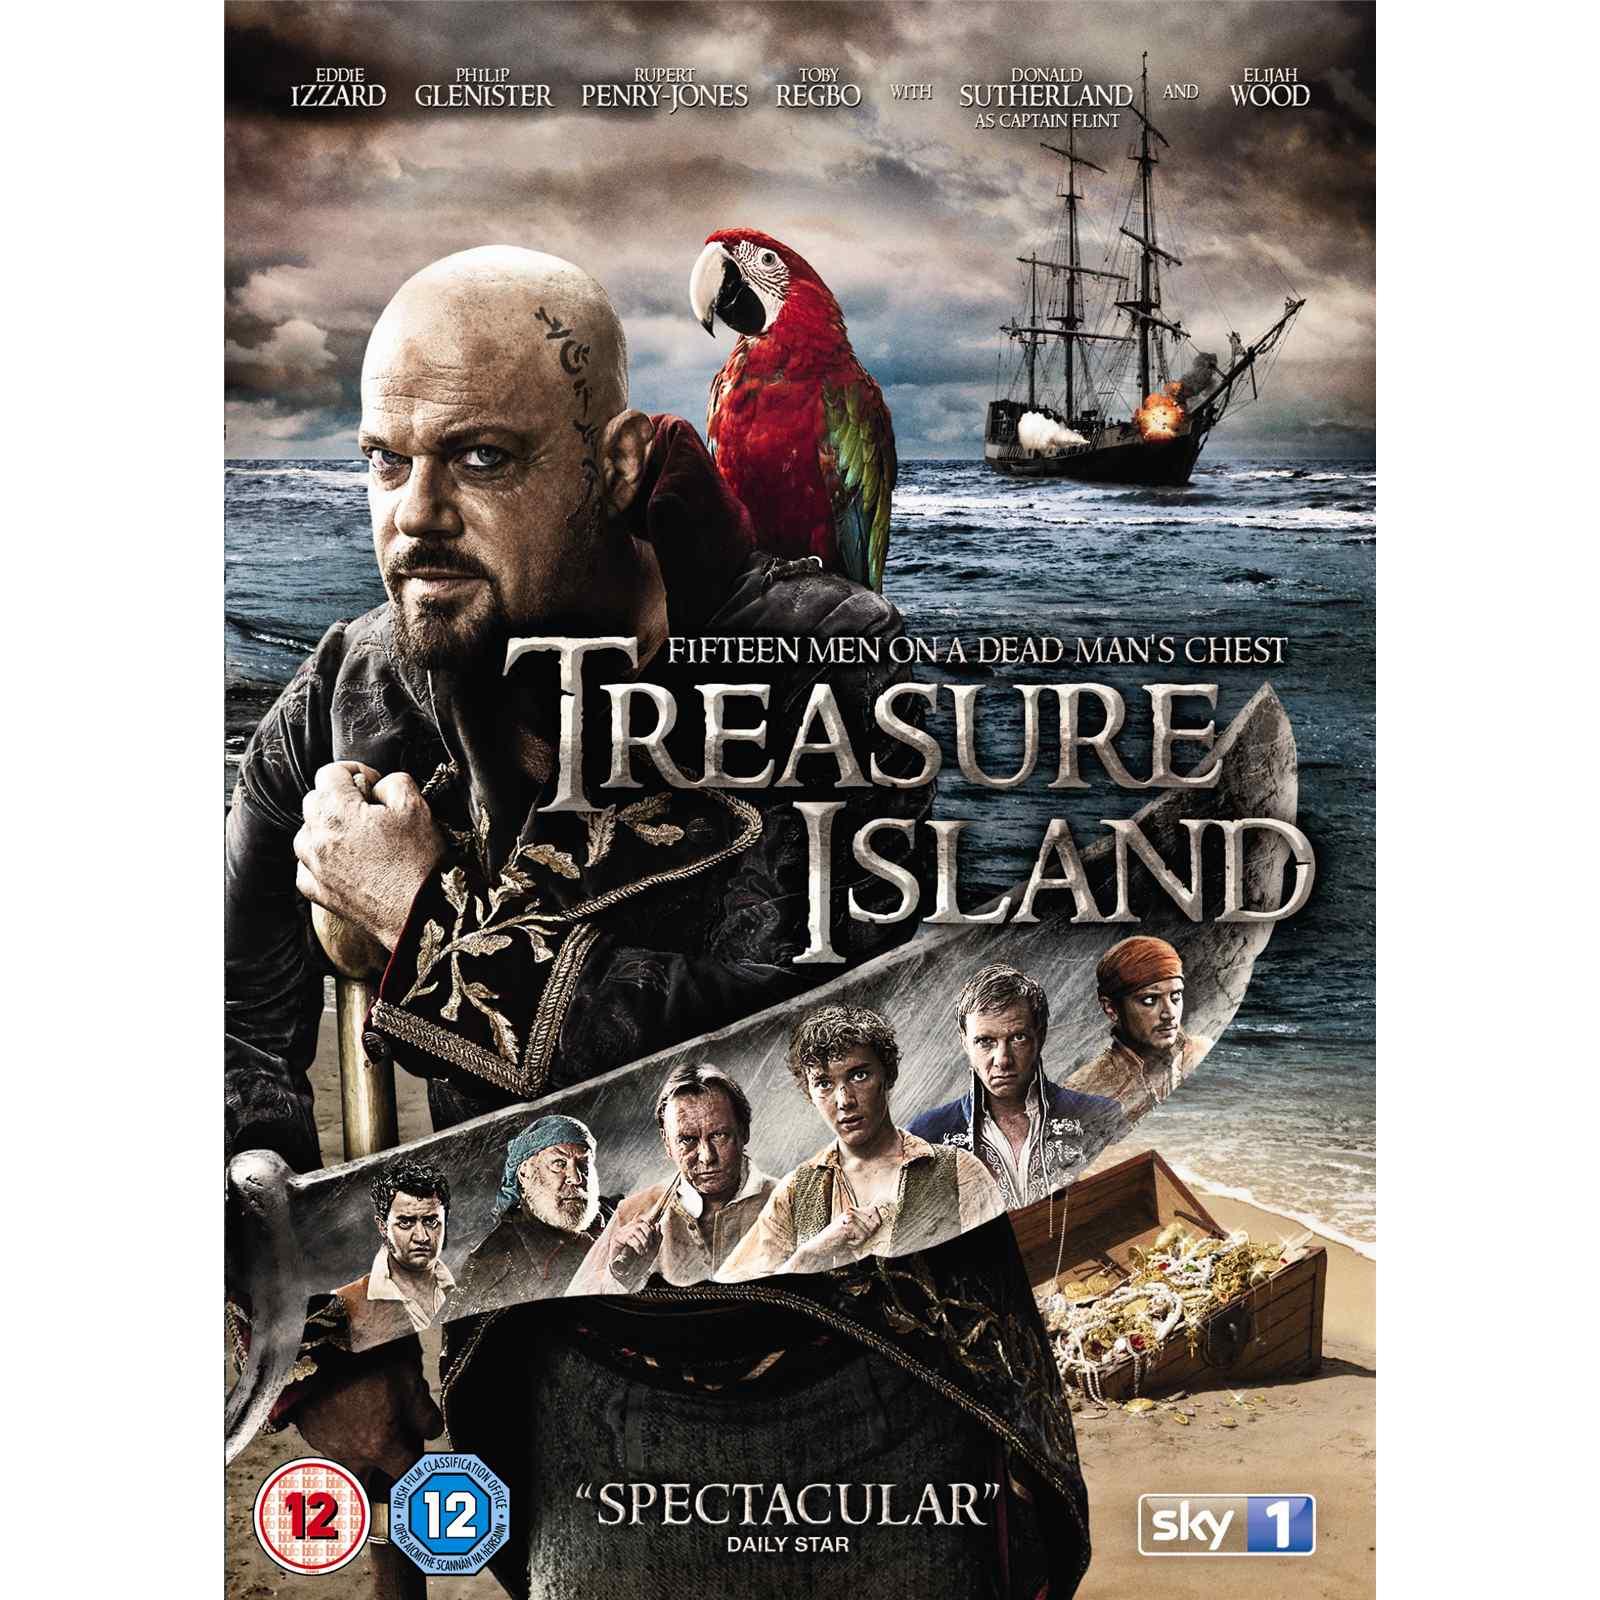 The Treasure Island Imdb 50 Shades Darker Full Movie 2015